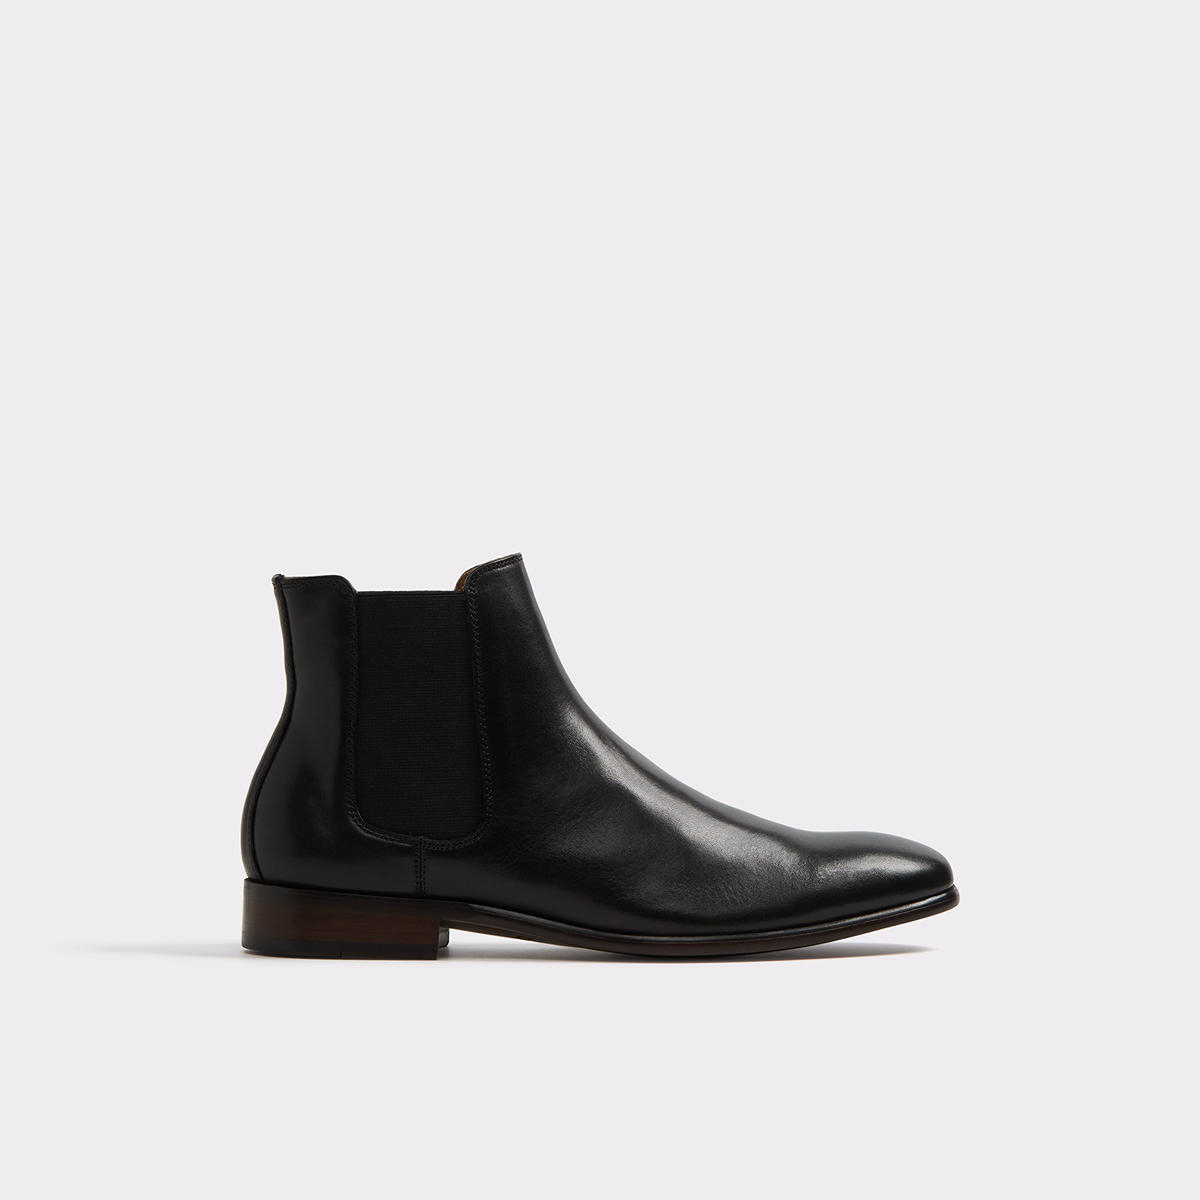 Aradowen Black Men's Dress boots | ALDO US at Aldo Shoes in Victor, NY | Tuggl